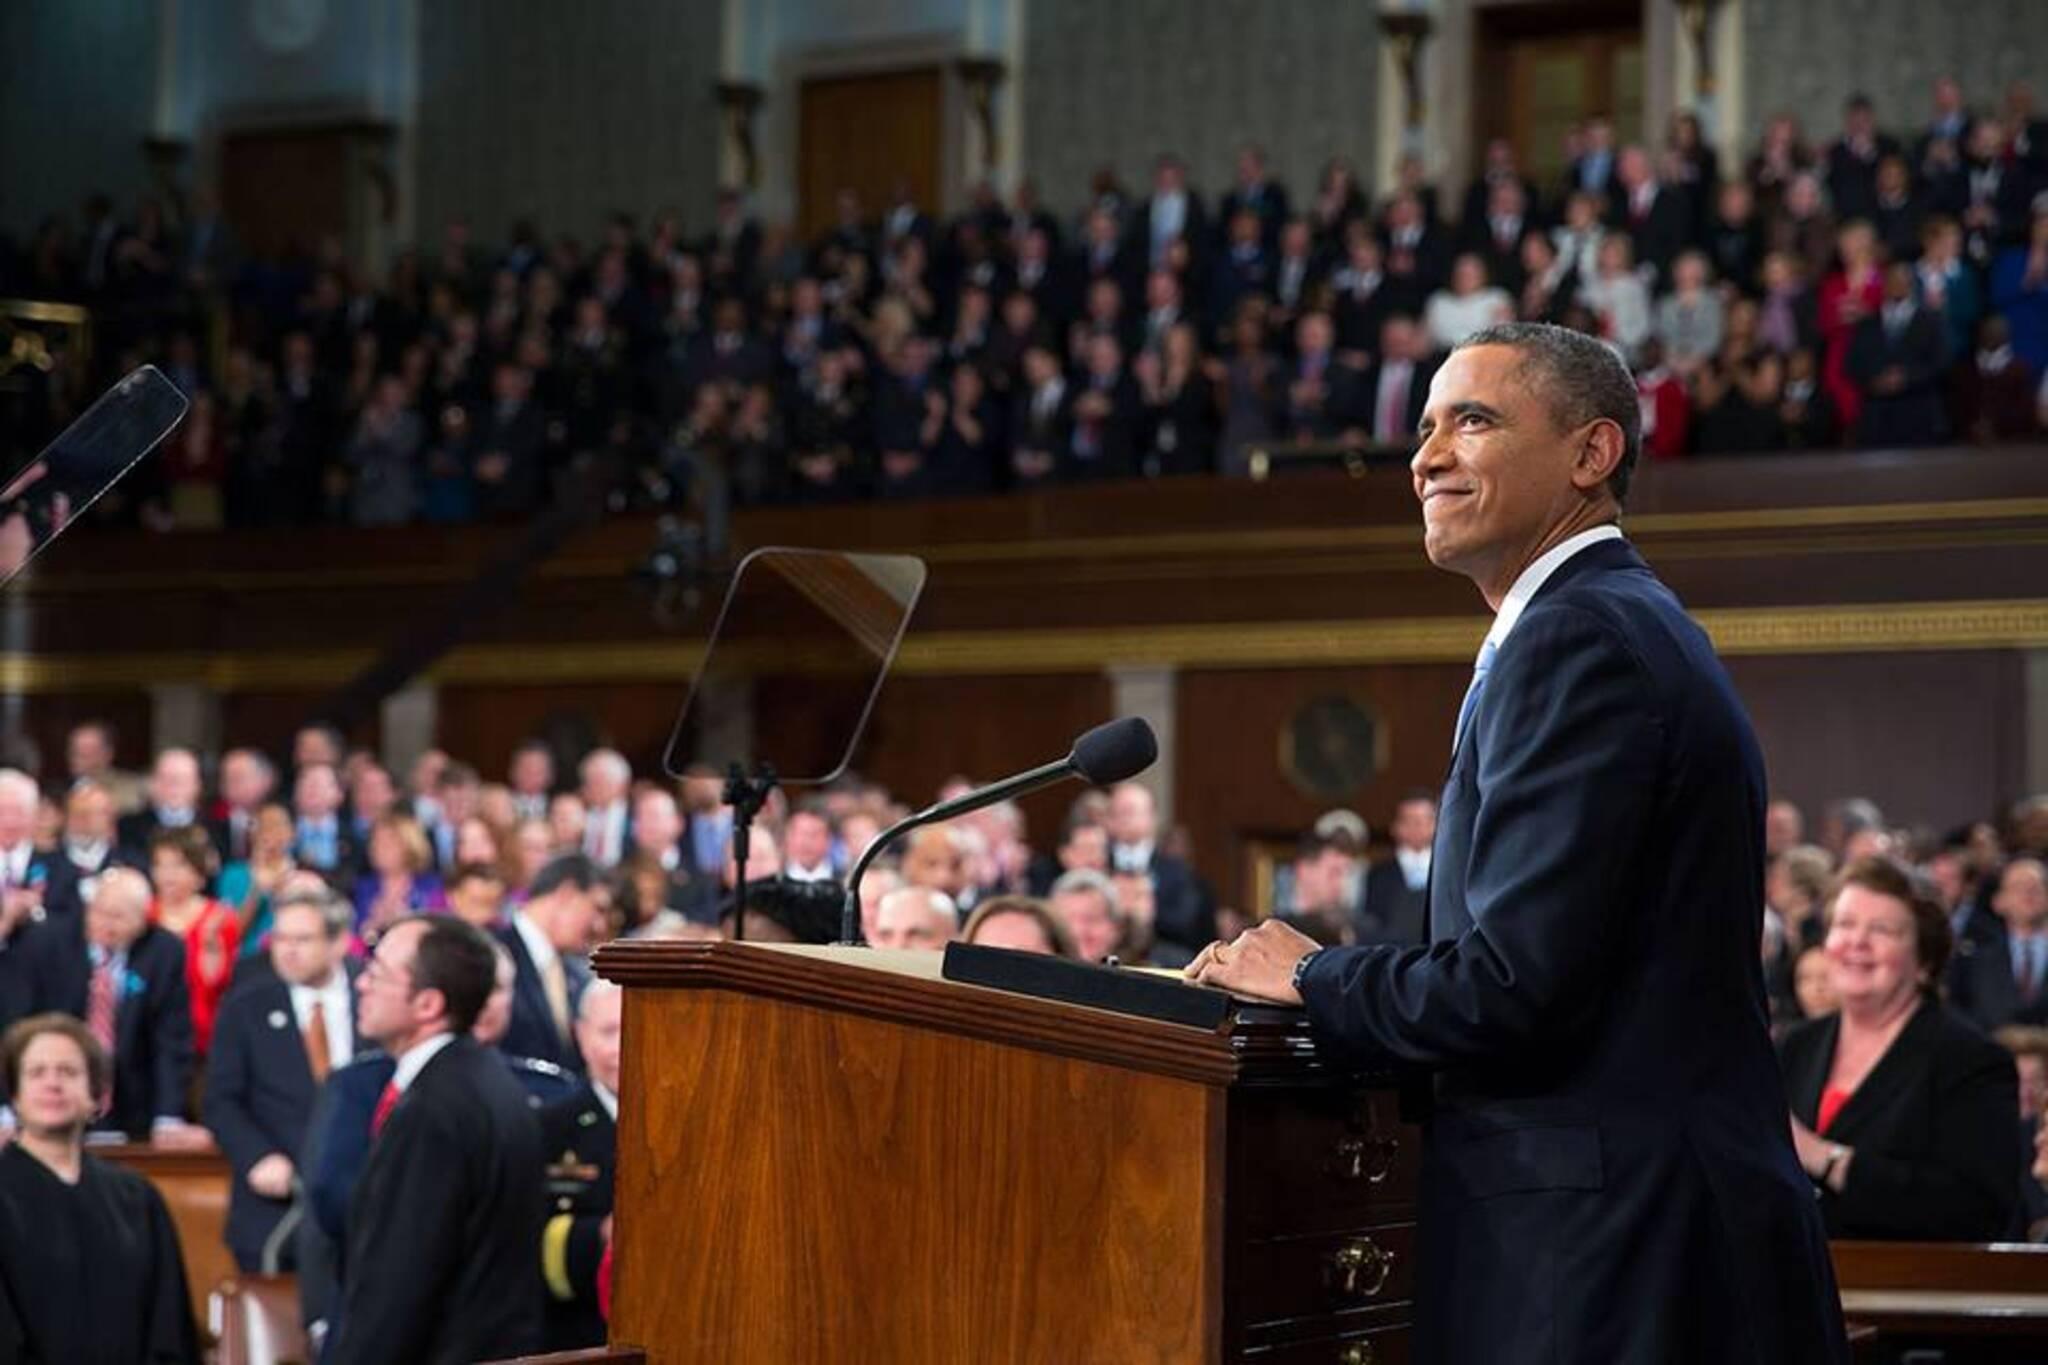 obama speech toronto